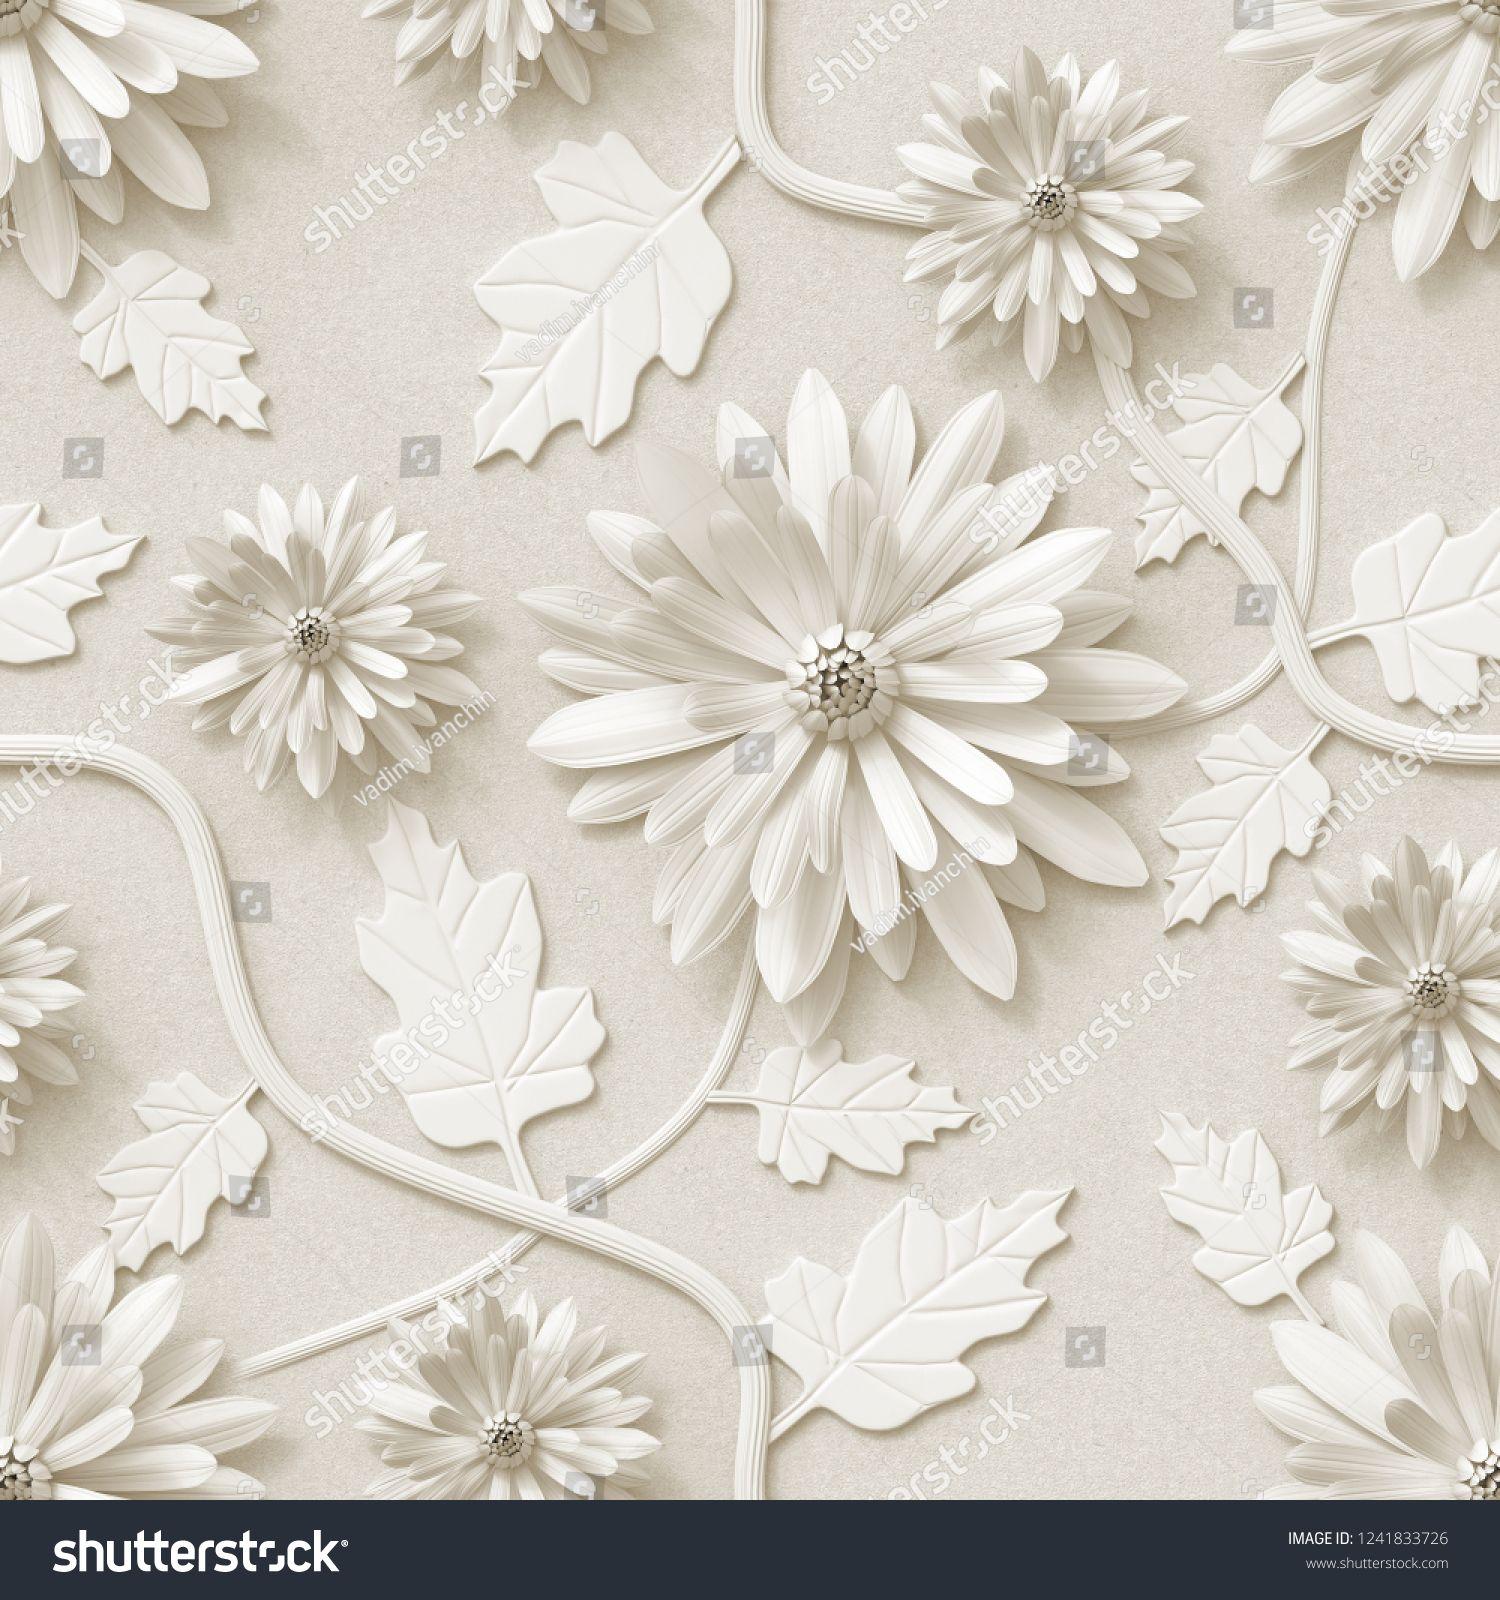 3d Background Floral Wallpaper Flowers Chrysanthemum Seamless Wallpaper Floral Background Seamless Floral Wallpaper Wallpaper Roll Hand Painted Flowers